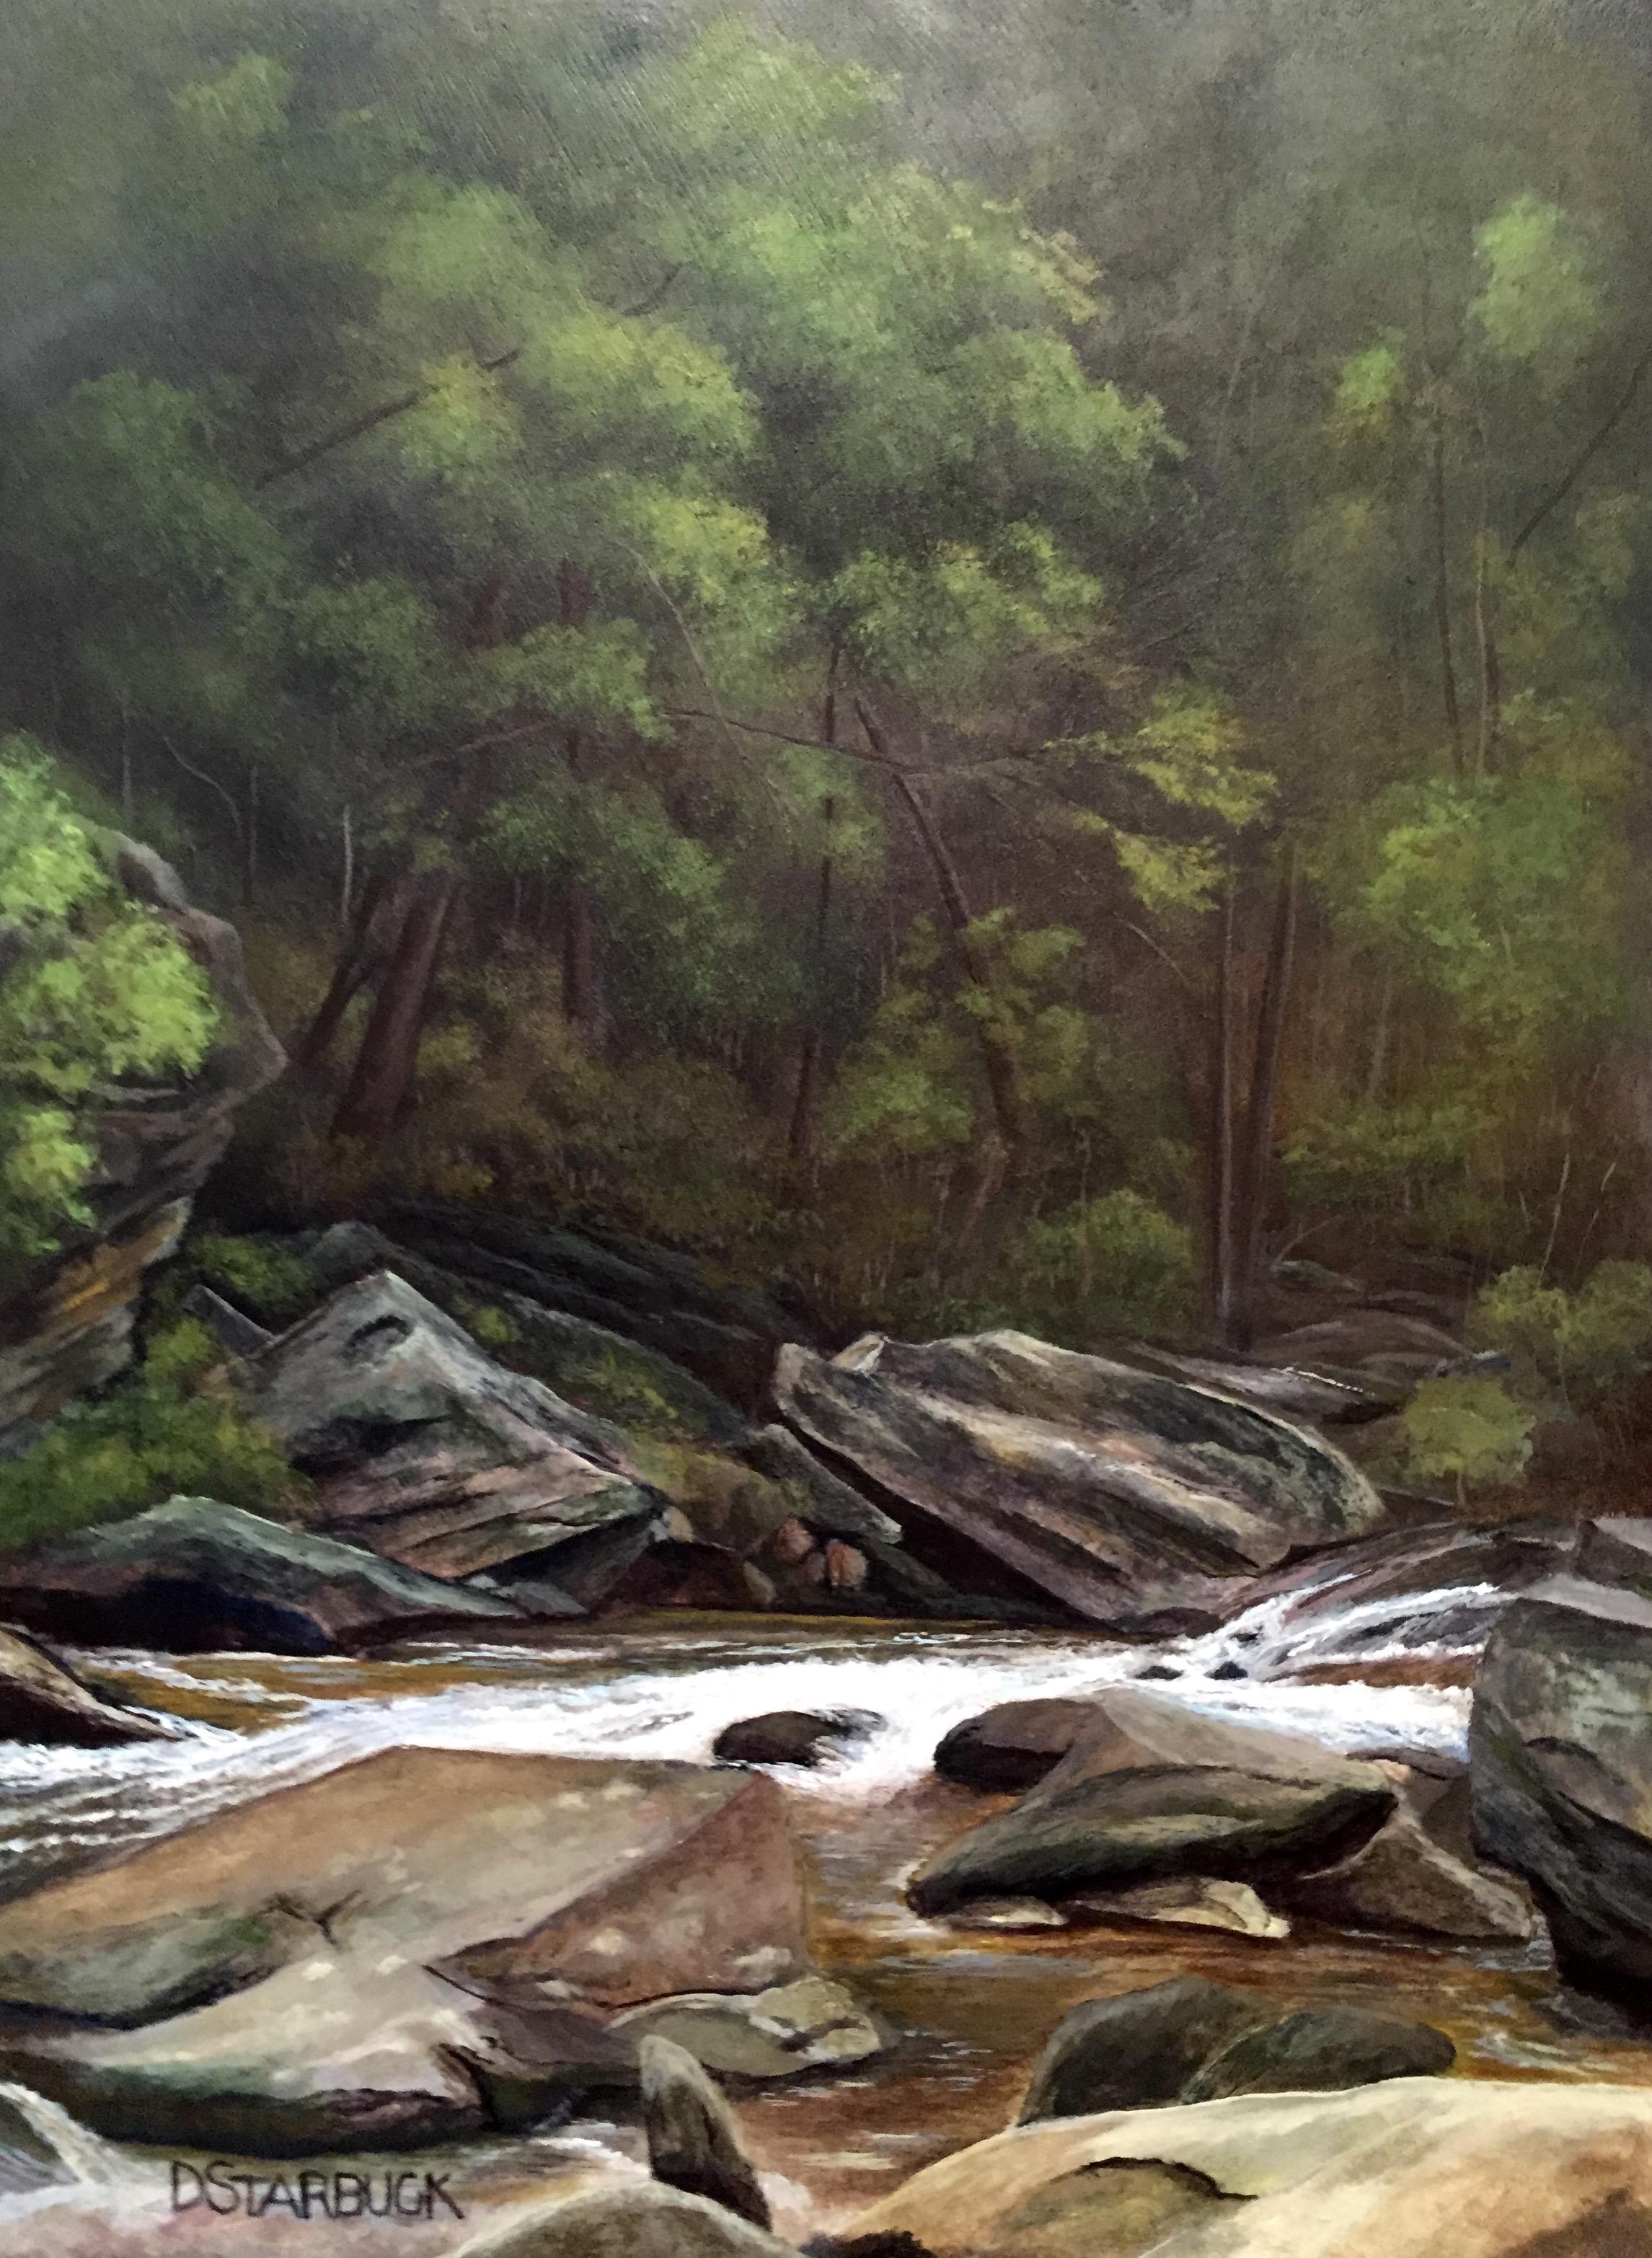 """Looking For Tight Lines"" Graggs Creek, Blue Ridge Parkway, North Carolina  Original: Acrylic on Panel, 10"" x 13.5"""